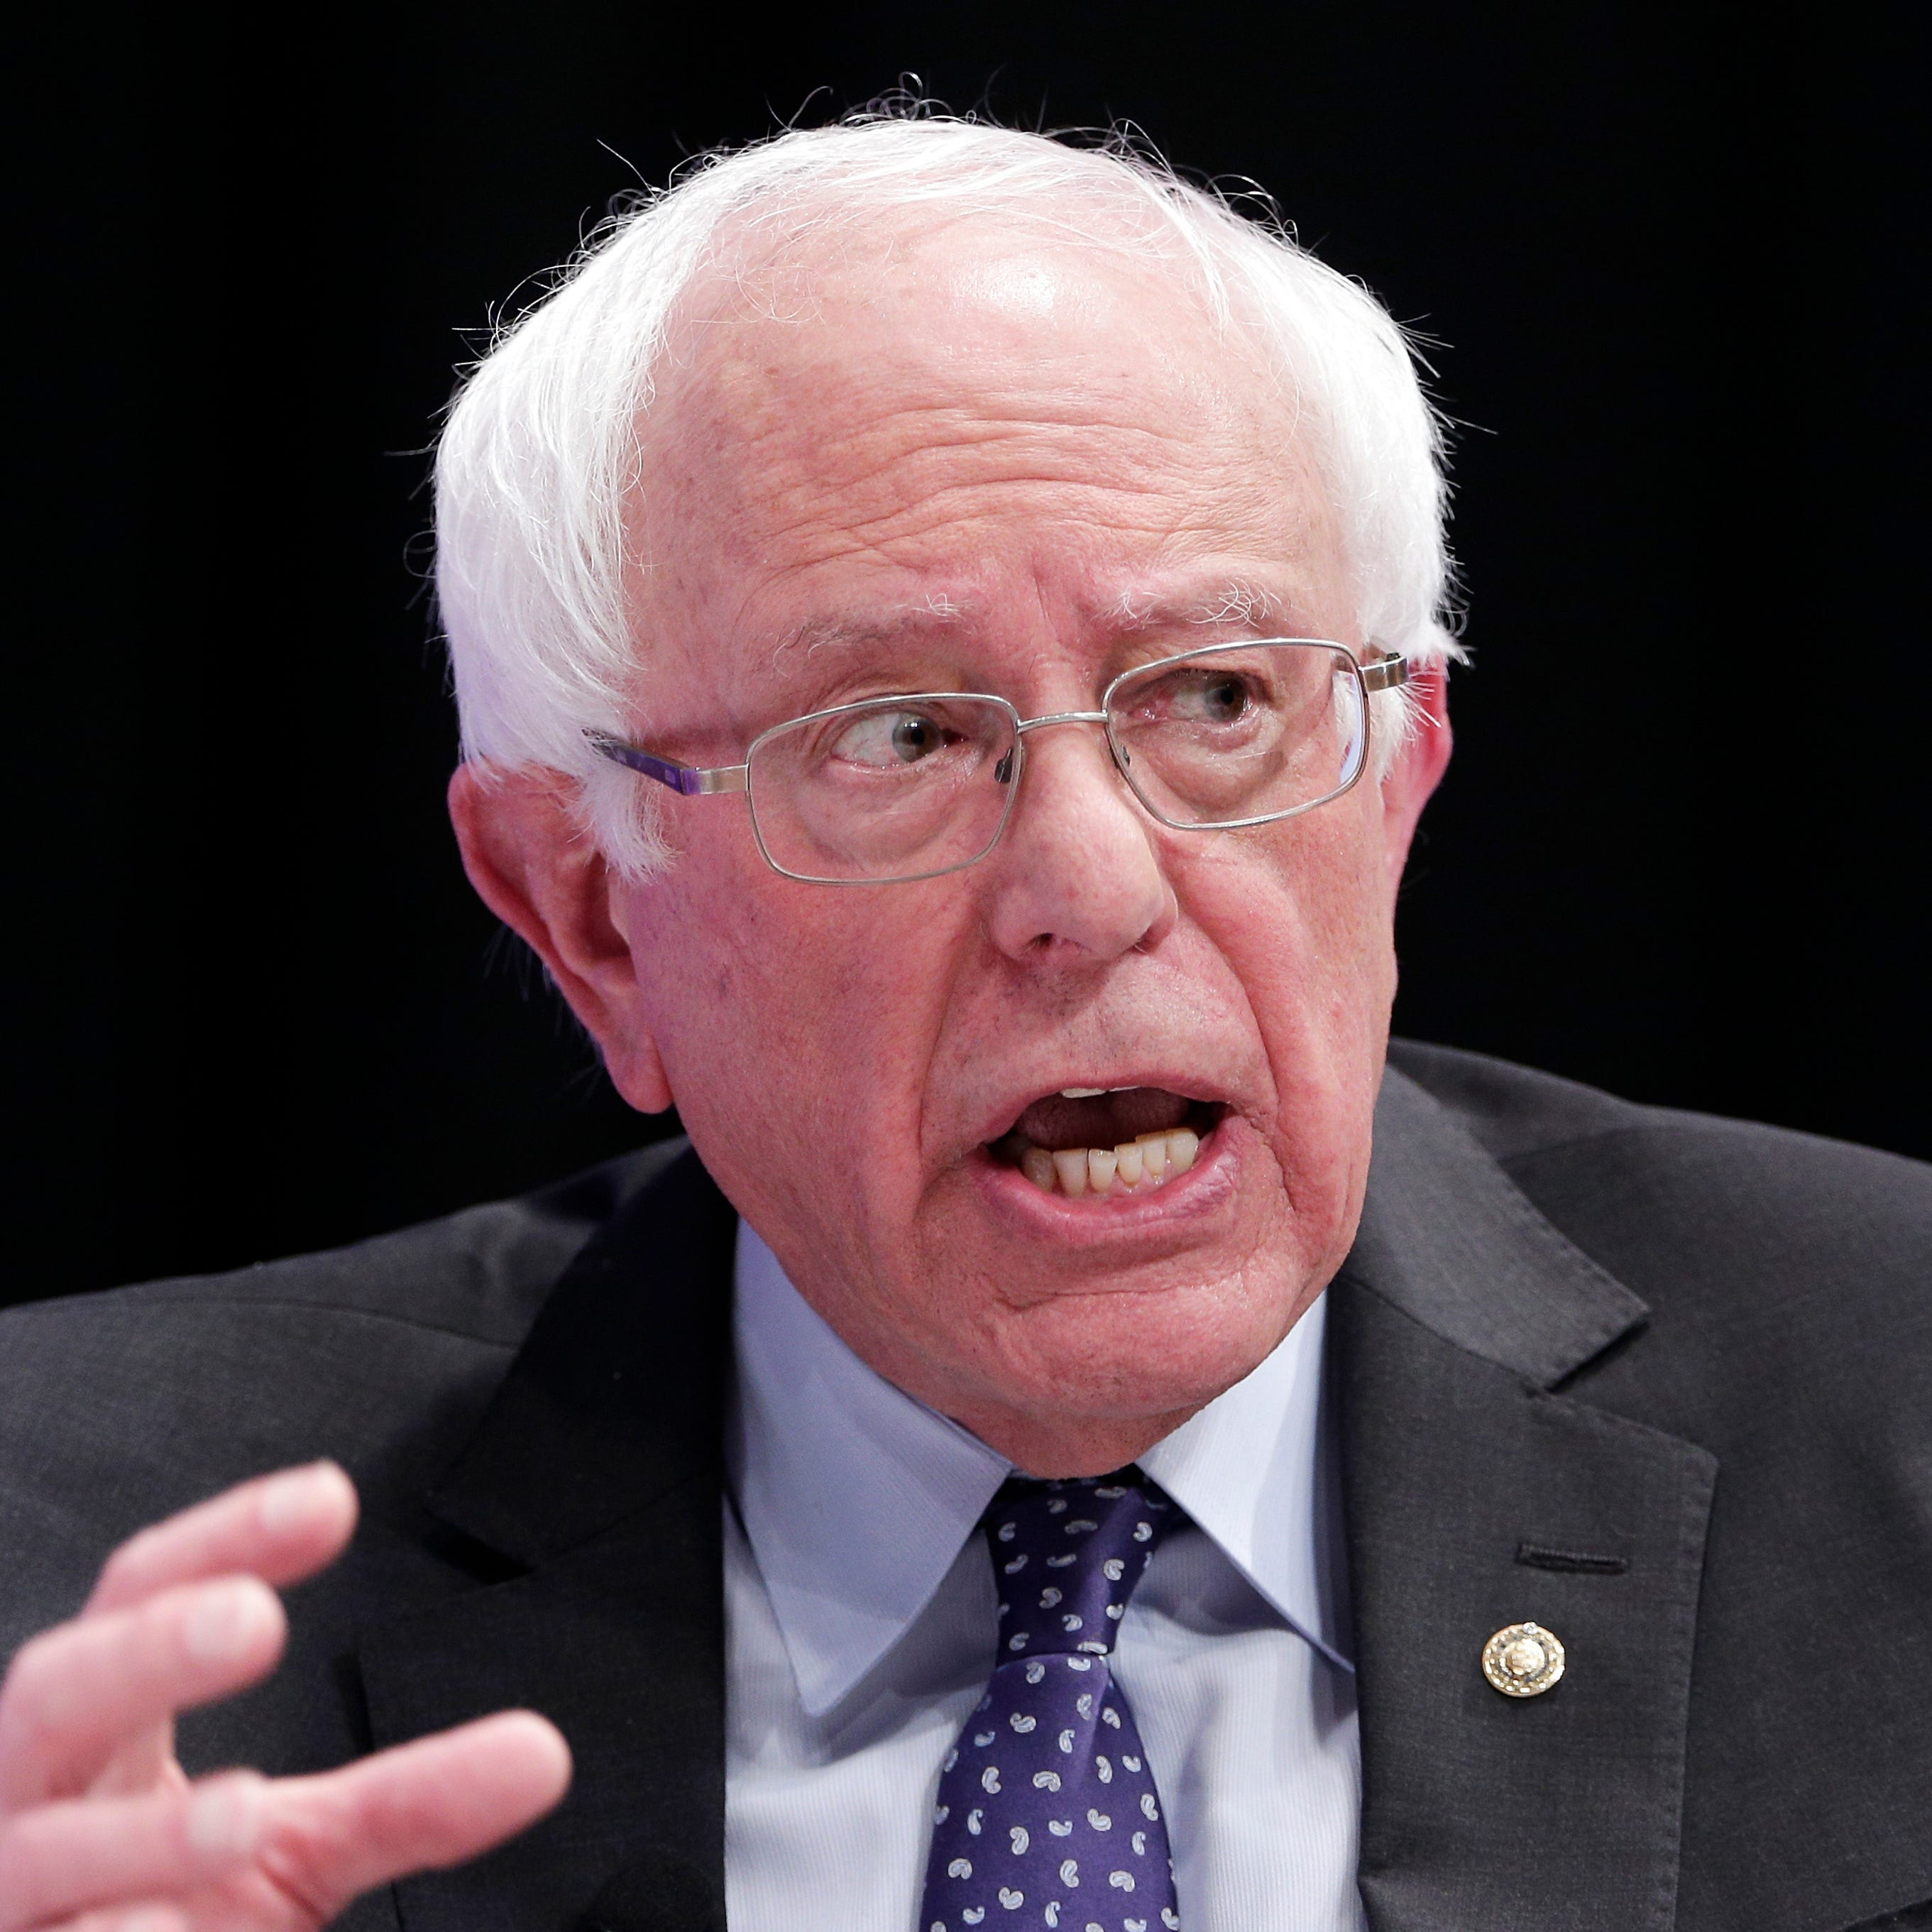 Bernie Sanders zeros in on Joe Biden as his favorite foil